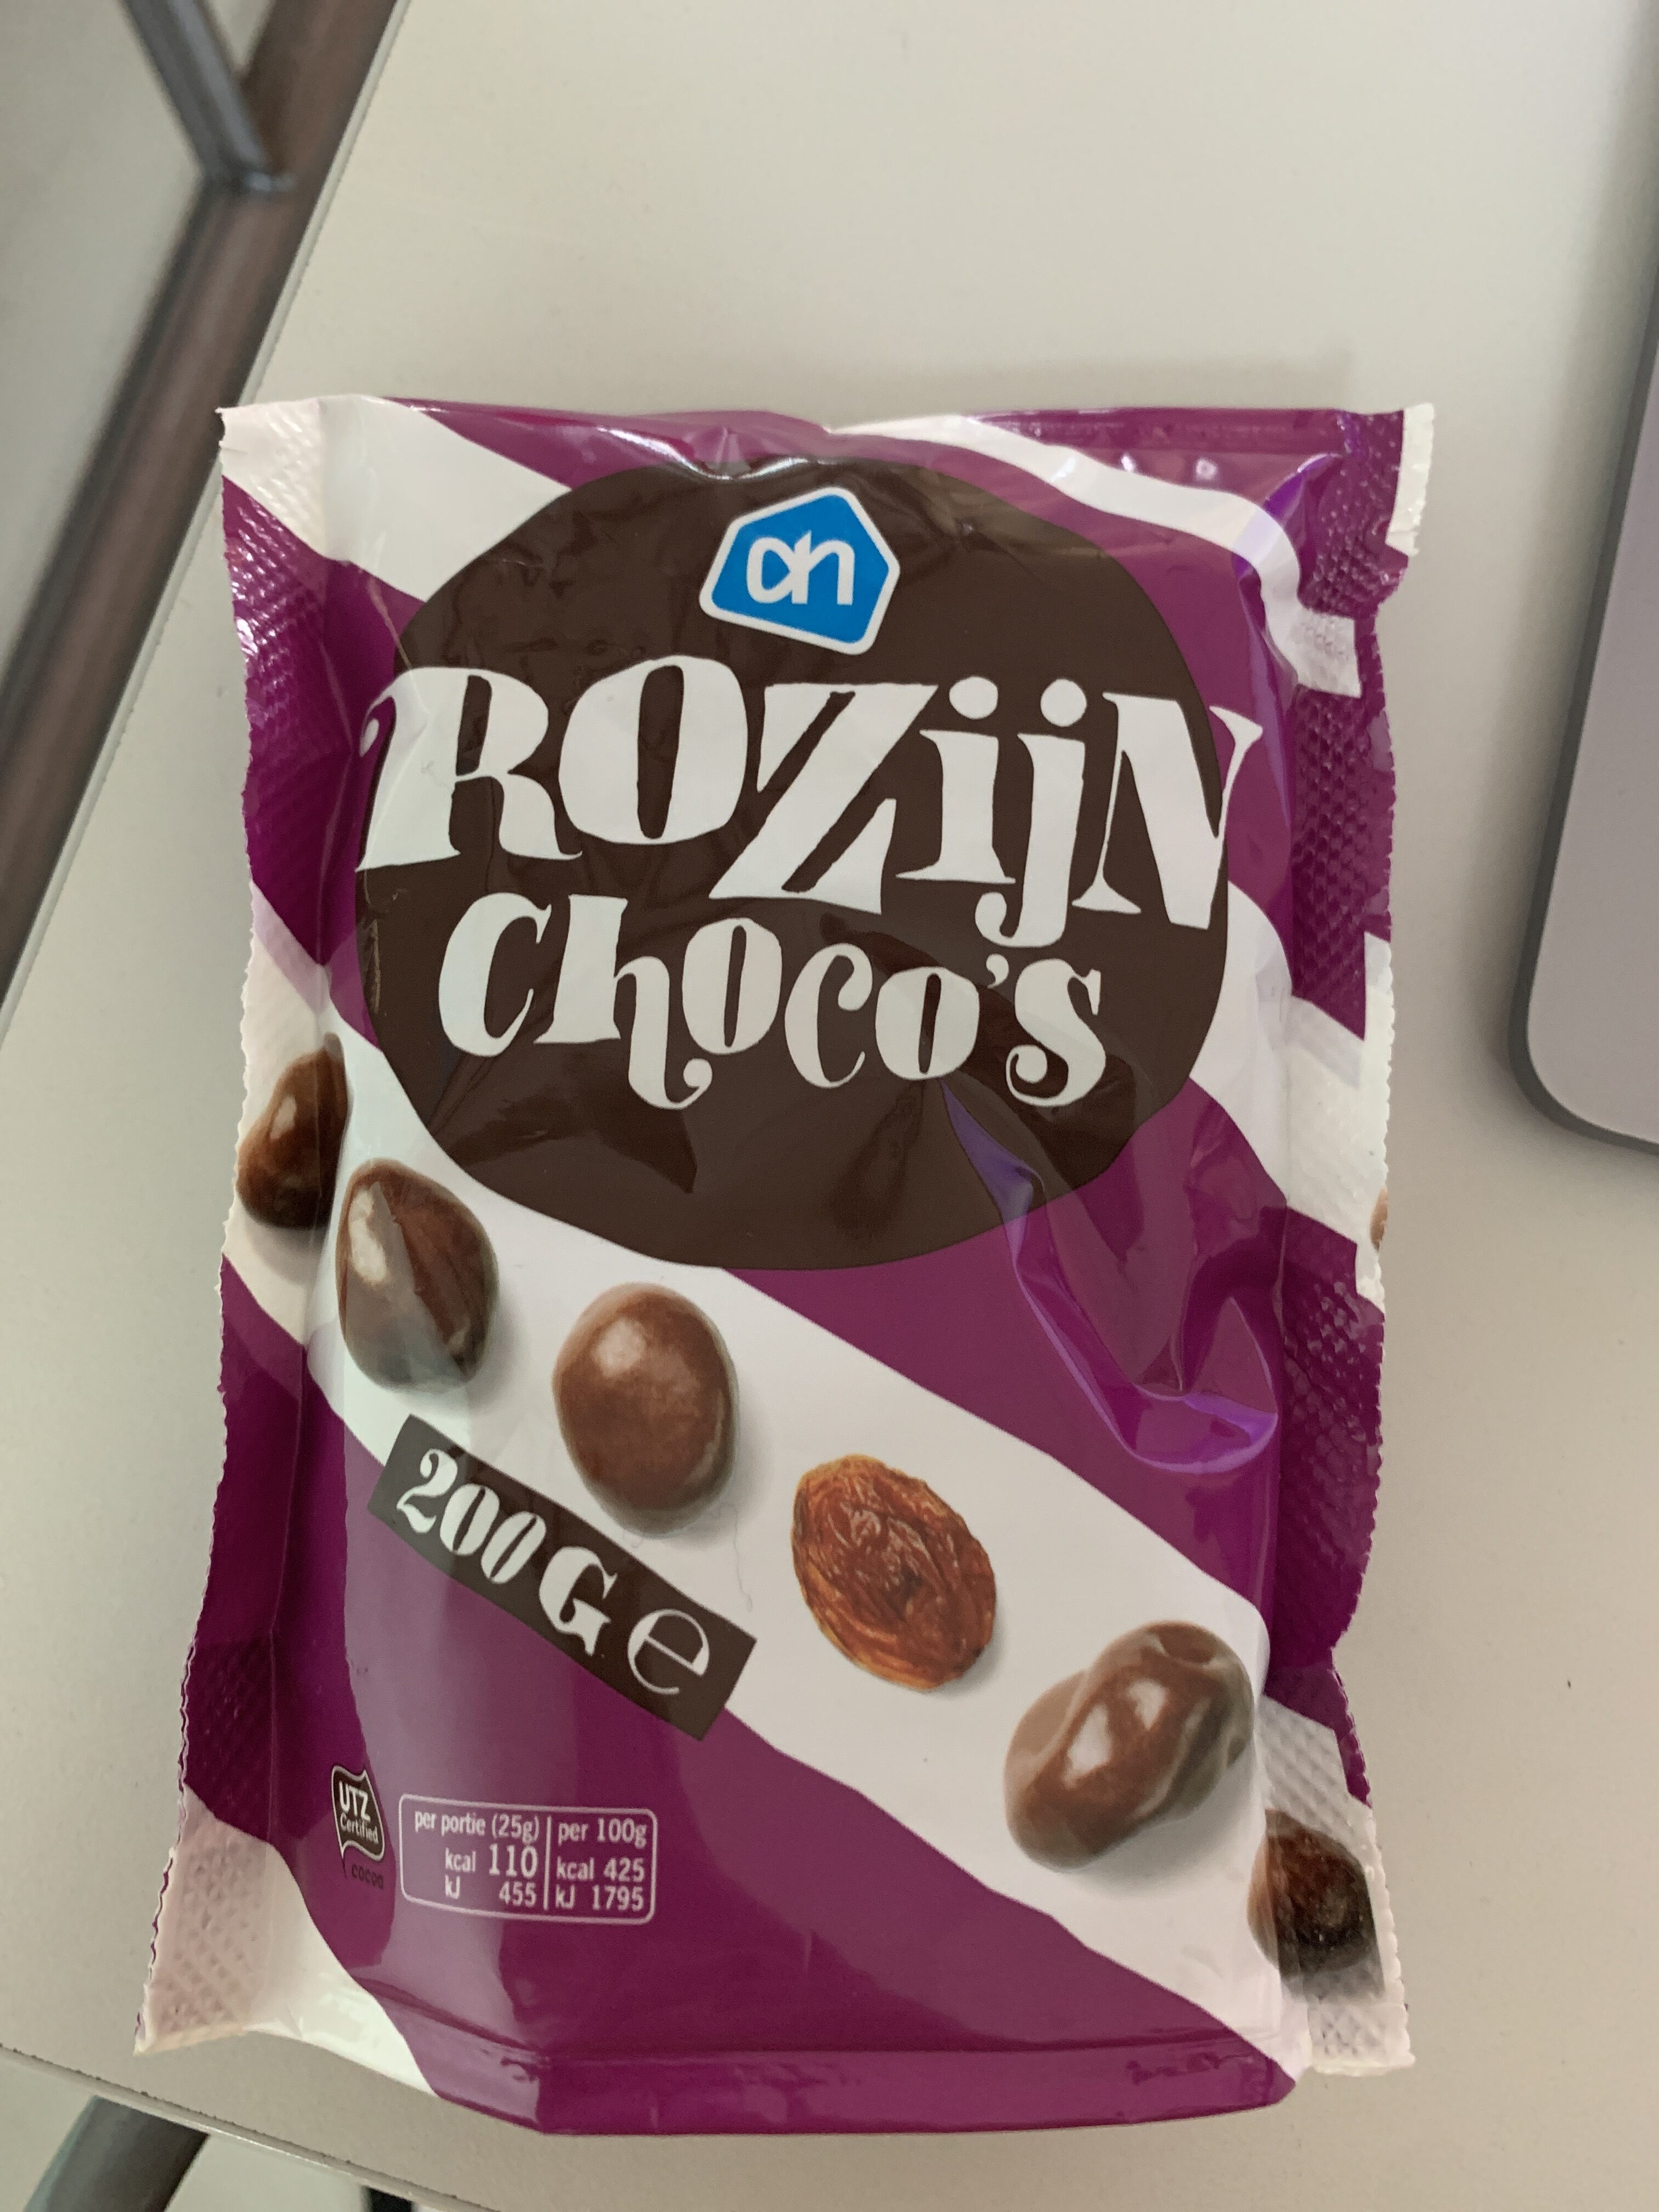 AH Rozijn Choco's - Product